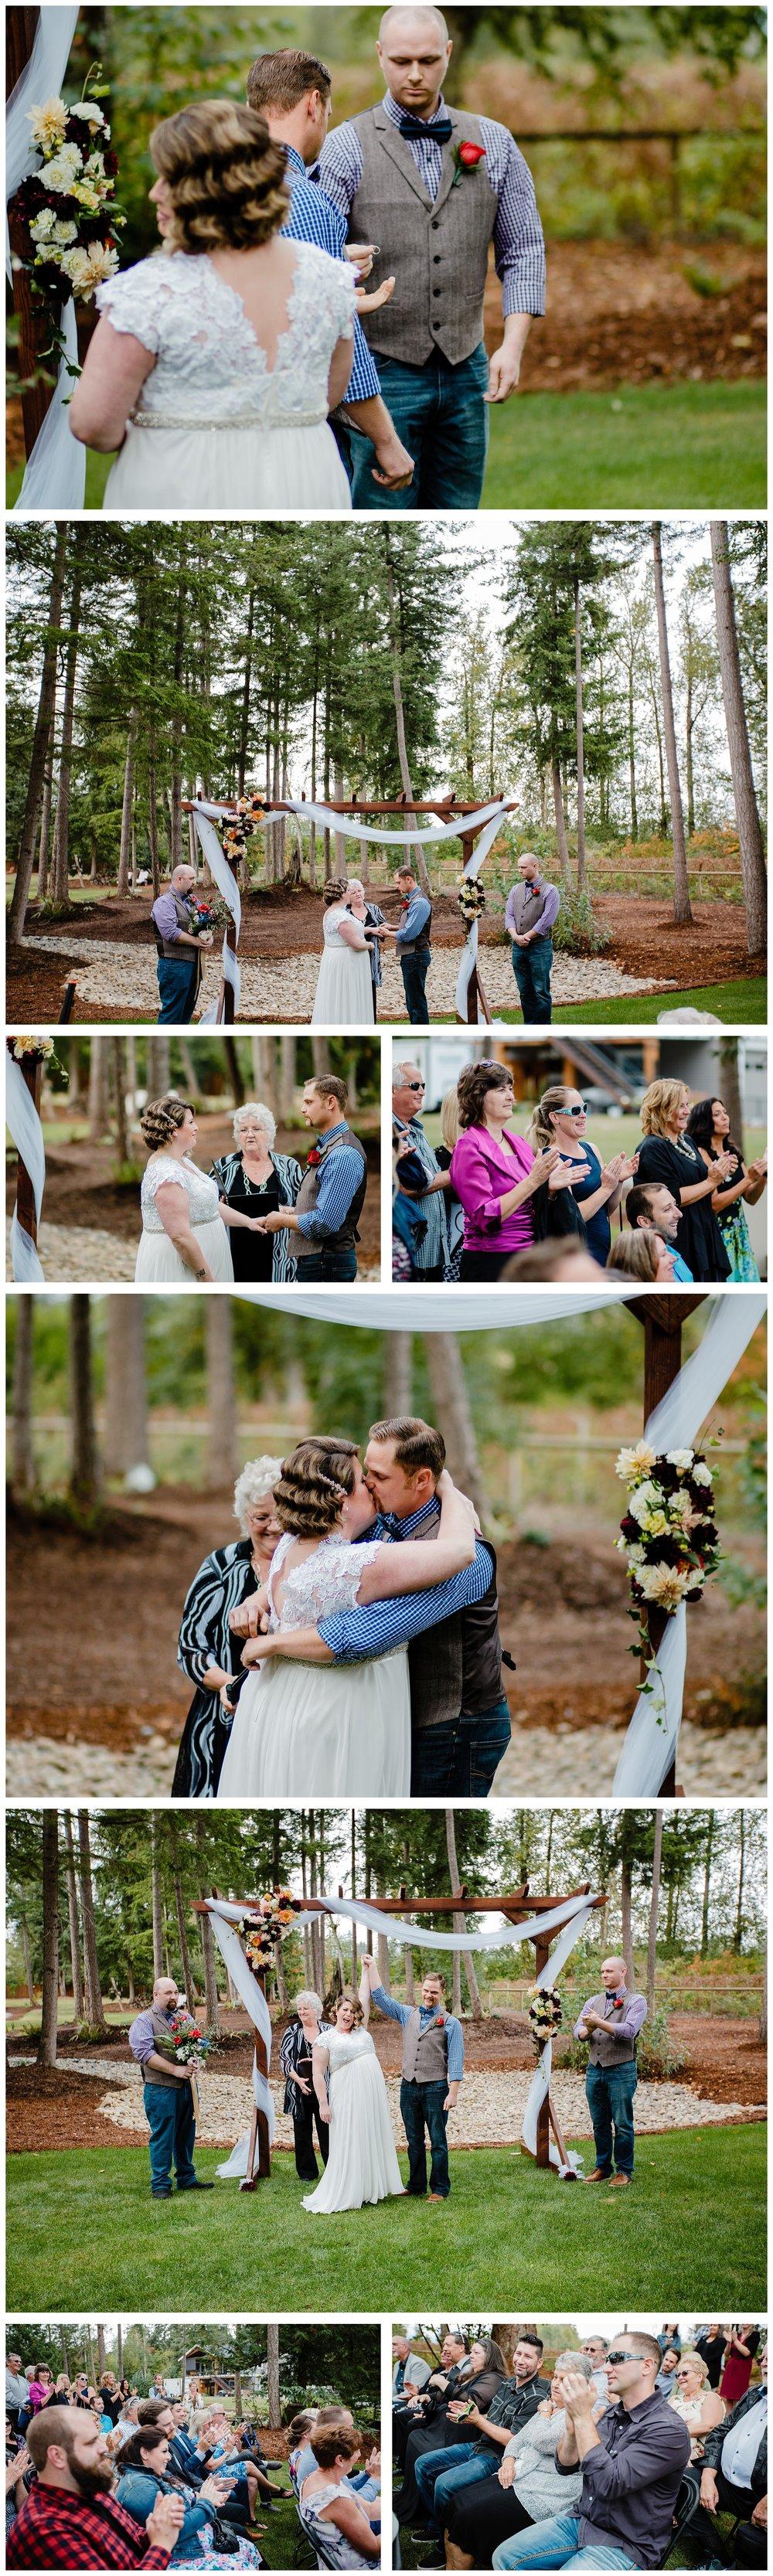 Aldergrove Park Fall Backyard Wedding Photographer Pregnant Bride Tent Outdoor BC Canada Best Wedding Photographer_0038.jpg